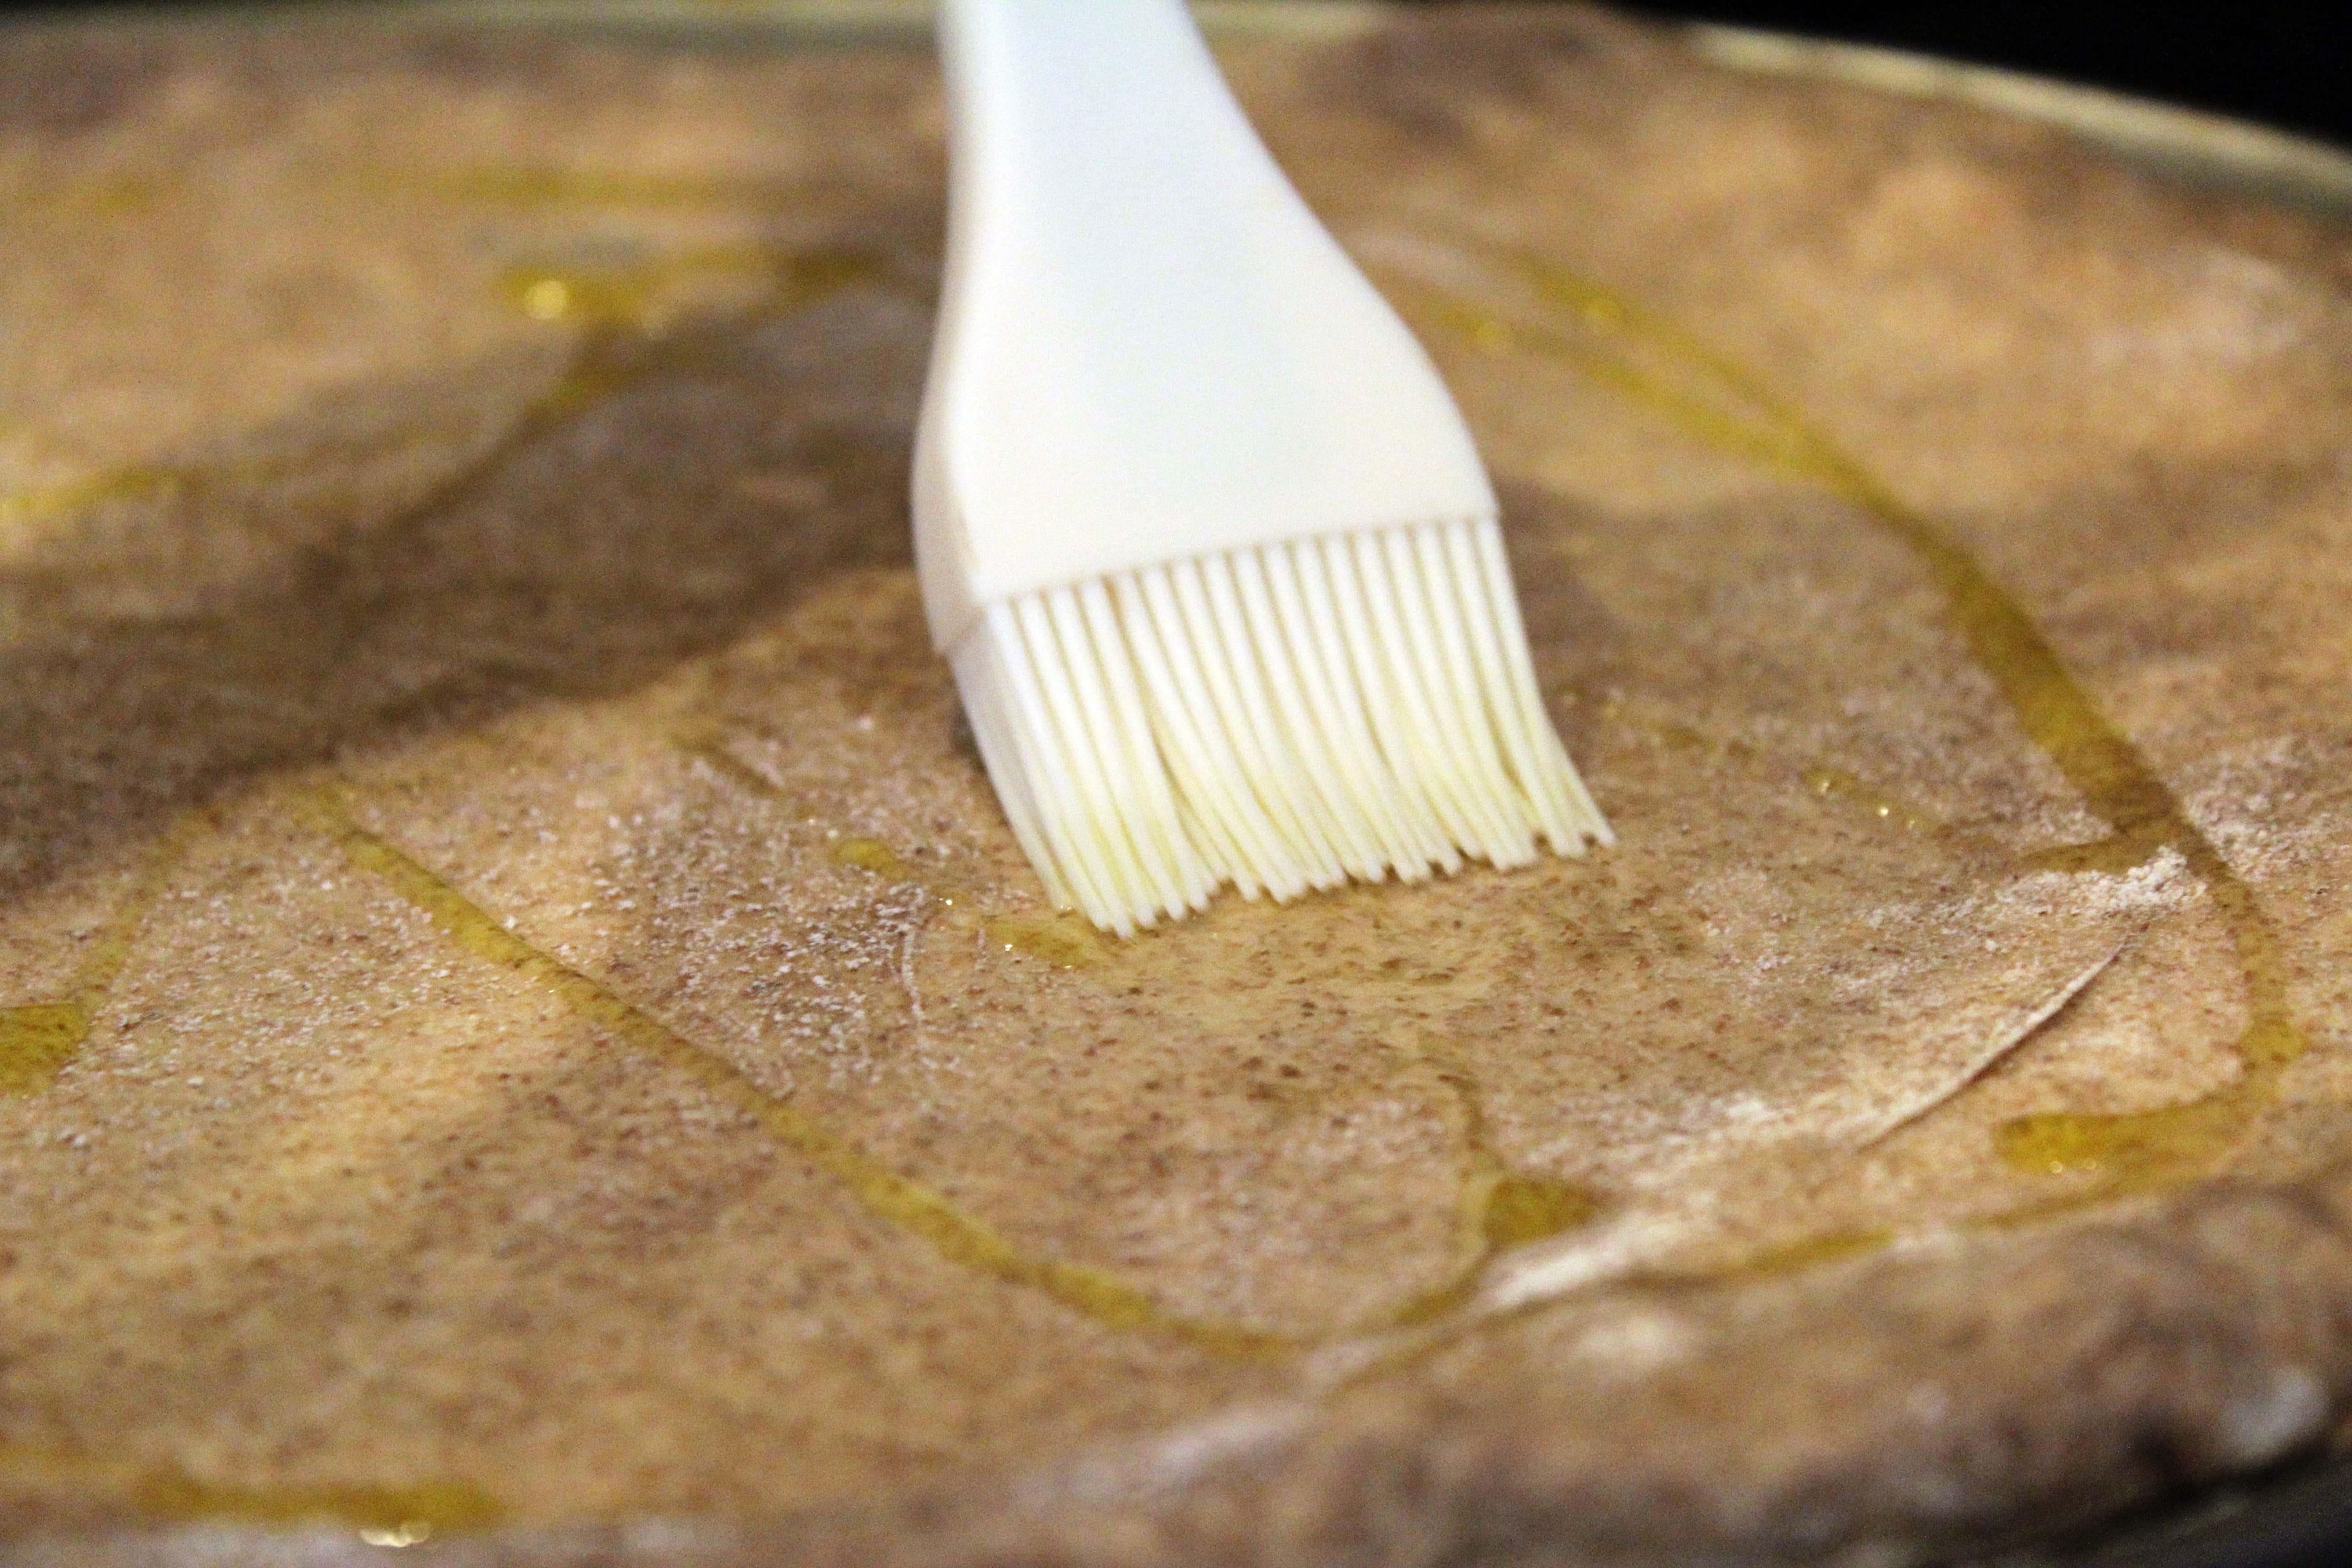 Spread olive oil on crust